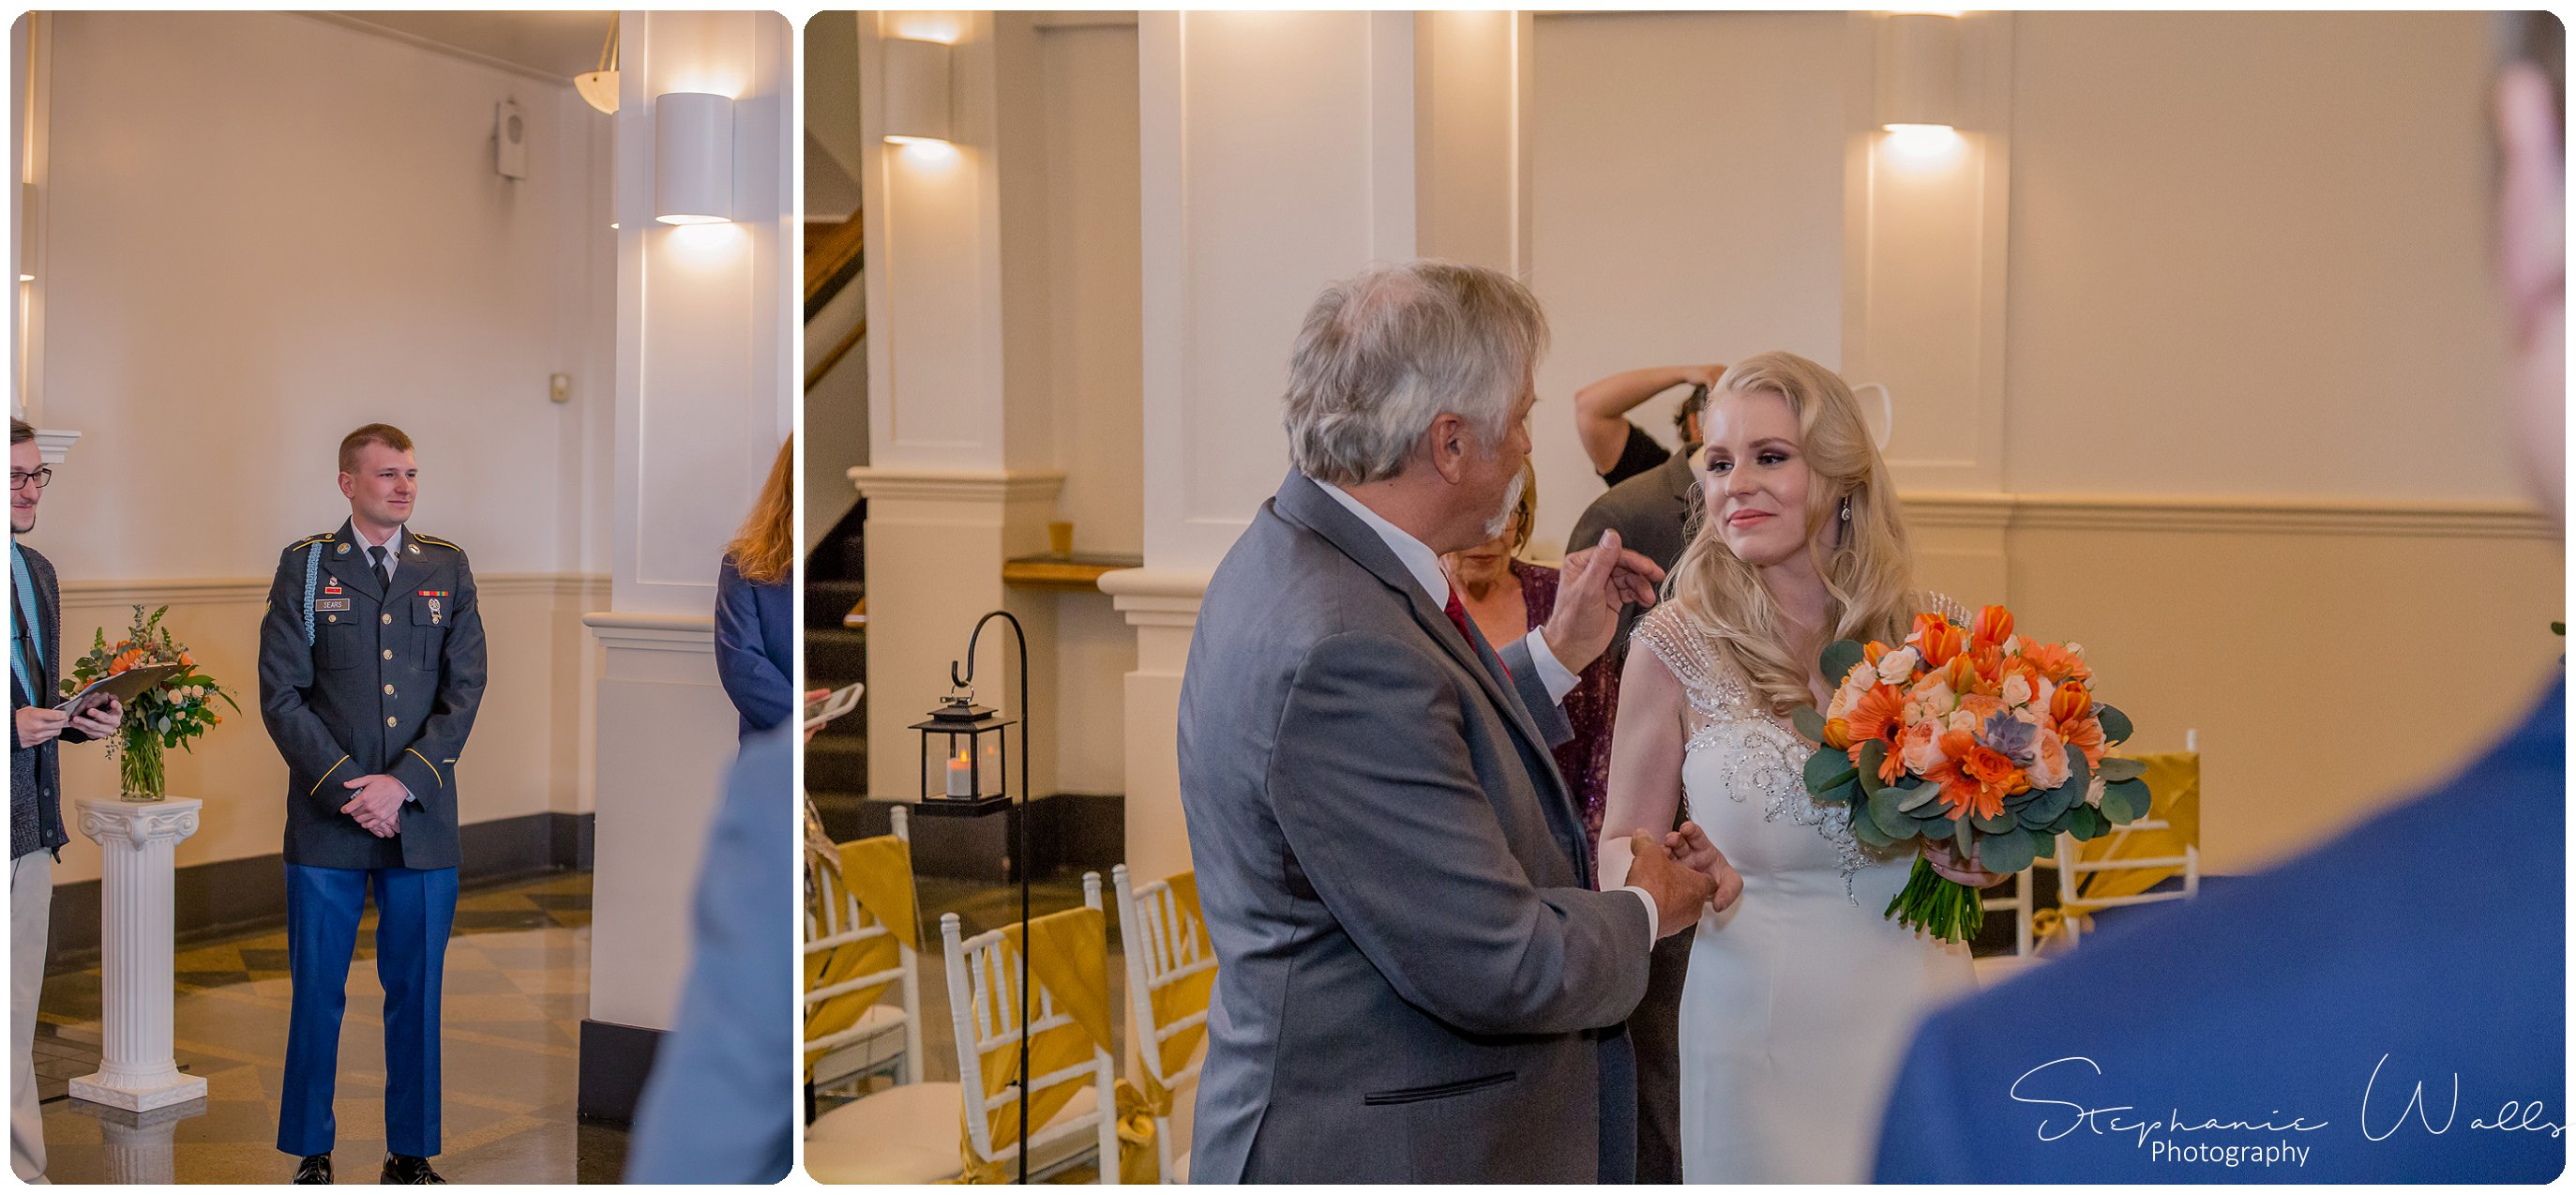 Sears Ceremony 070 The Hero & The Starlet | Monte Cristo Ballroom | Stephanie Walls Photography Weddings